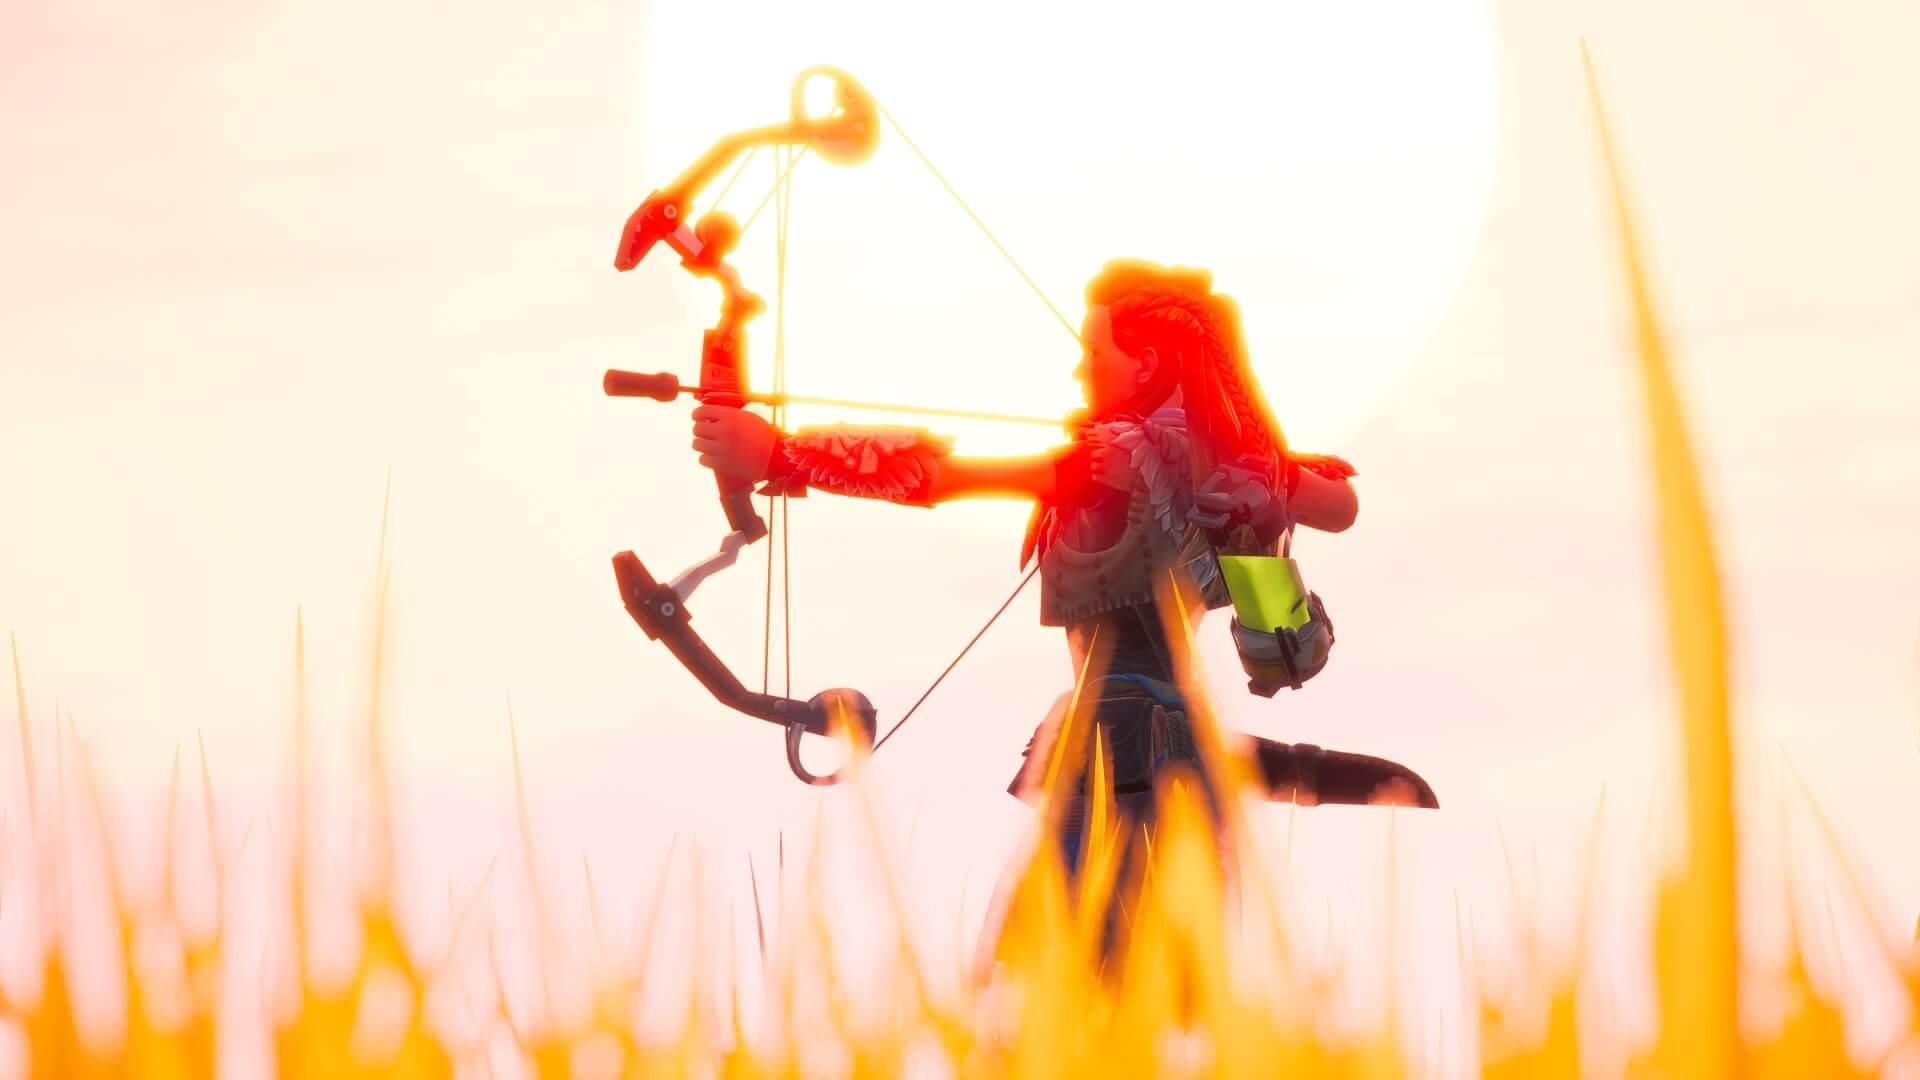 Samuel97333131 Archery Fortography